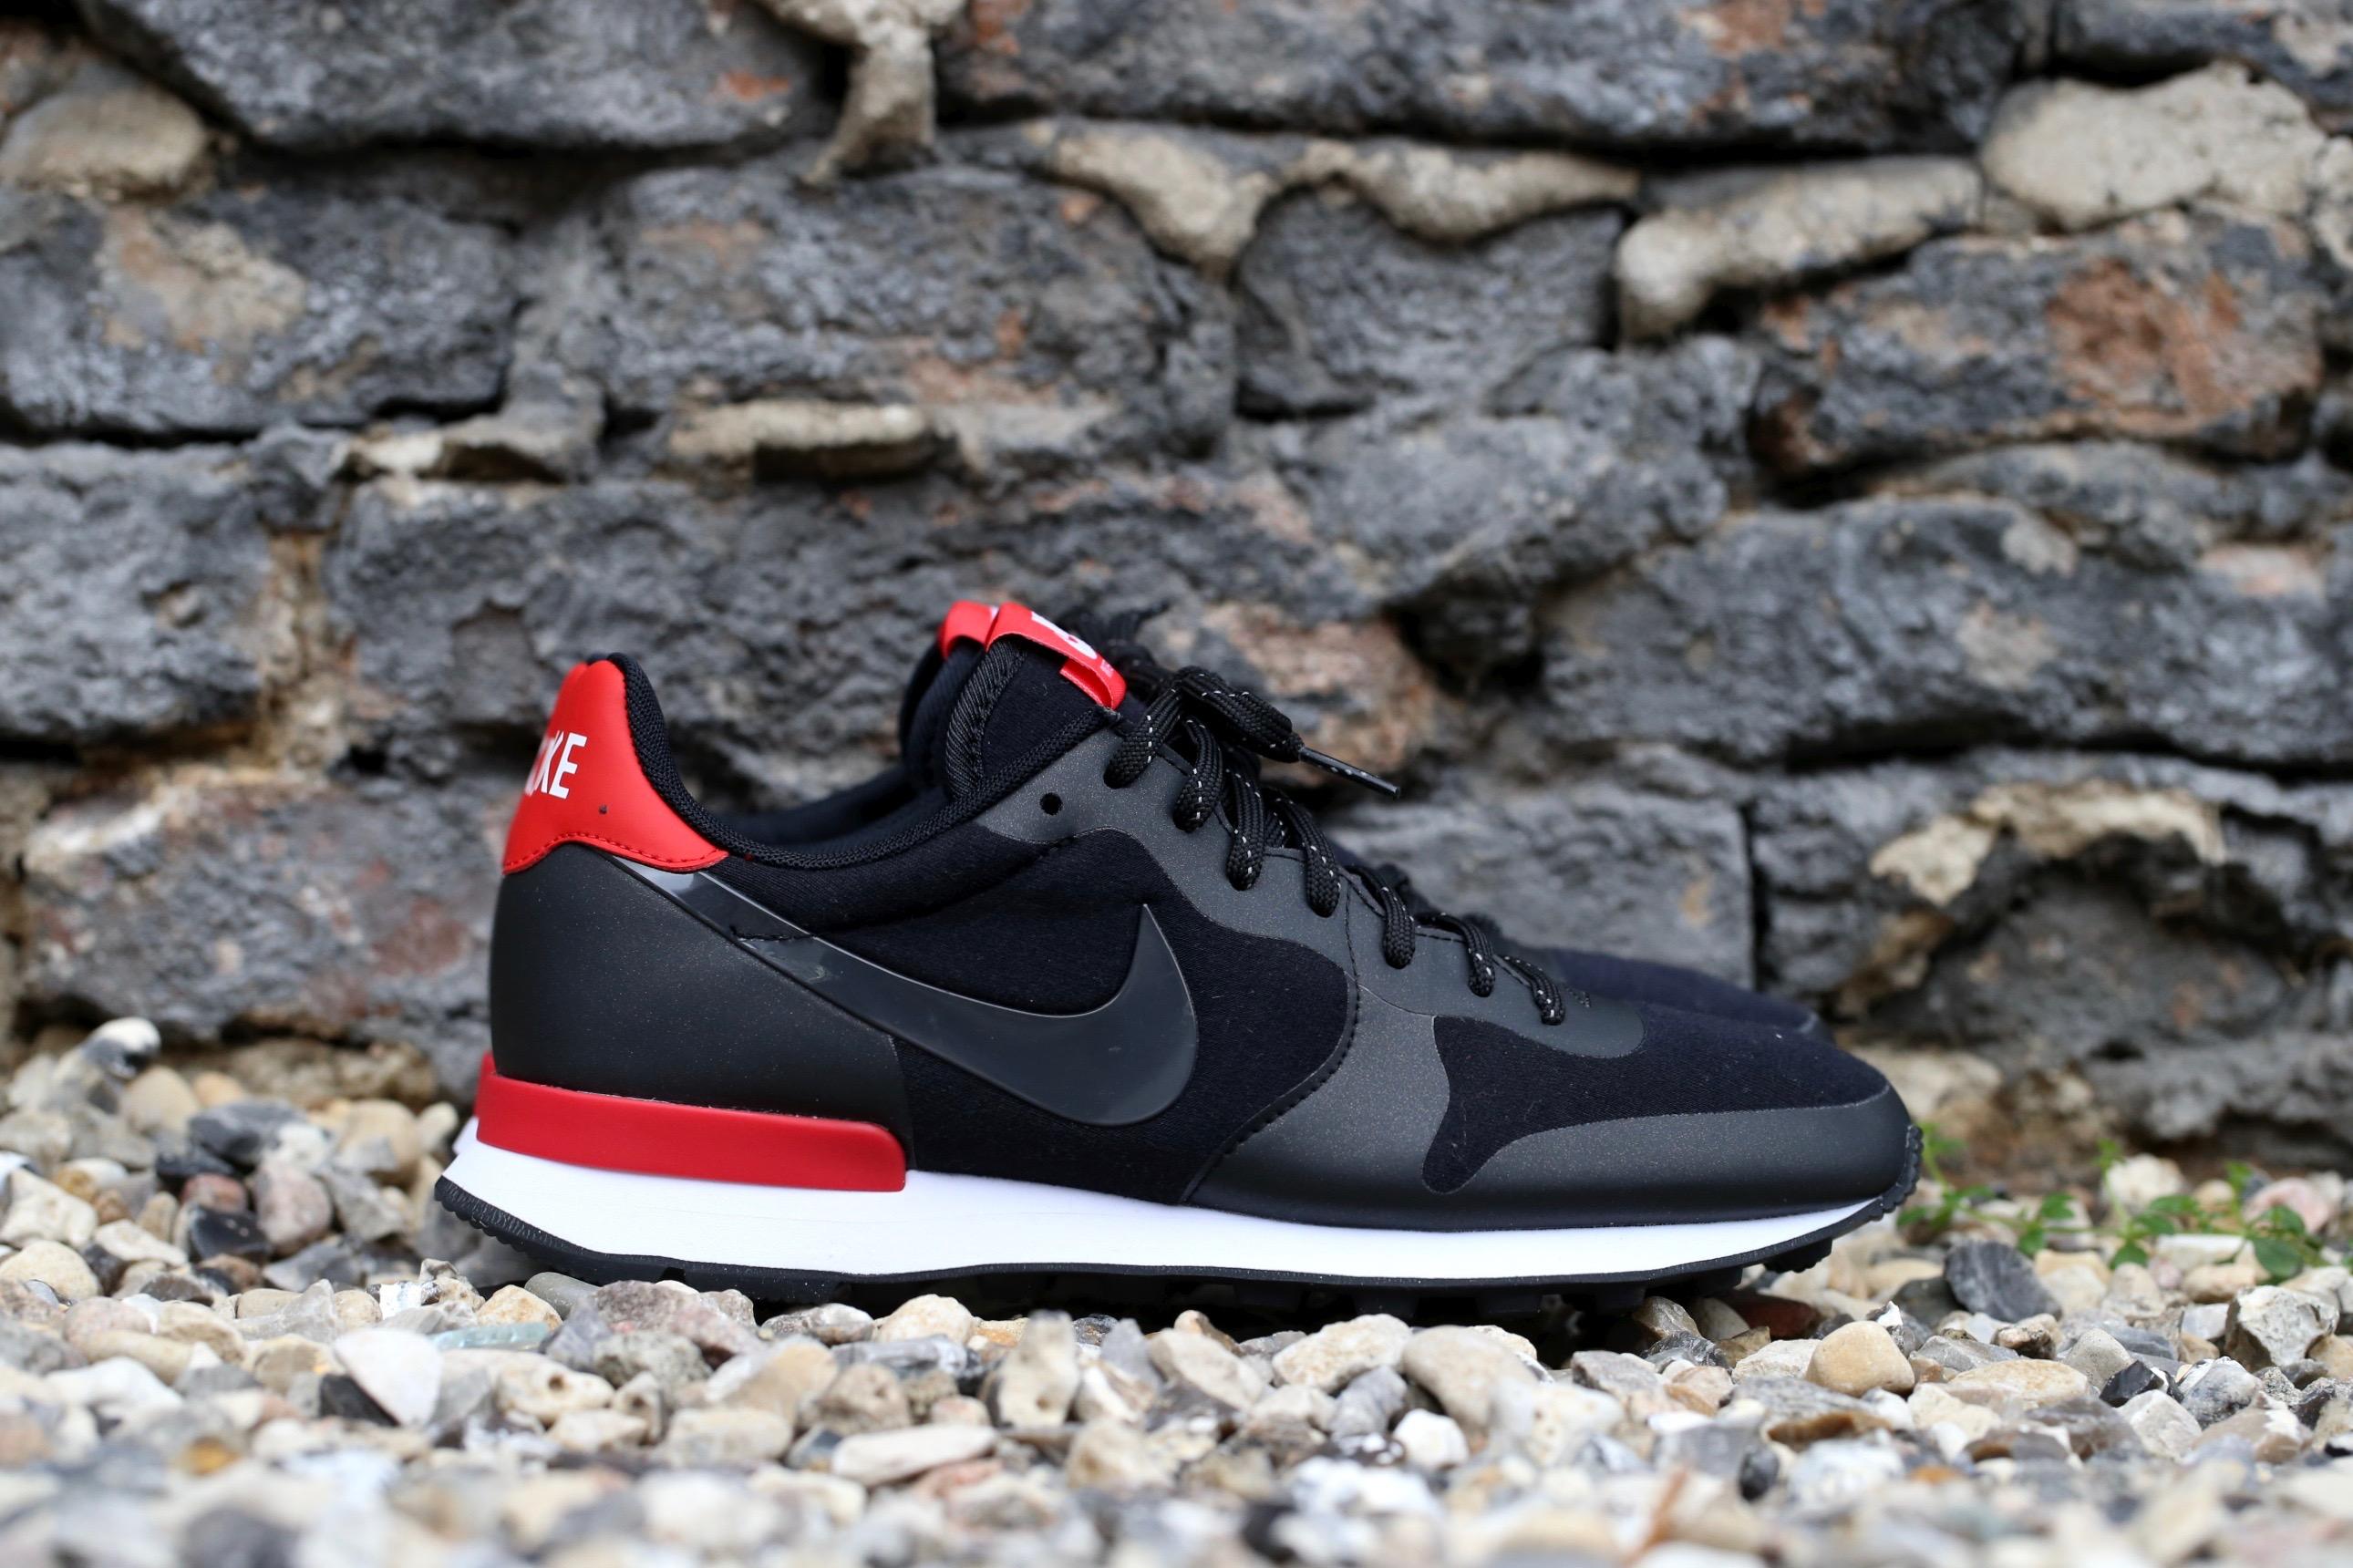 meet 5ab3e e7cf5 Nike Wmns Internationalist TP – Black   Challenge Red   White – STASP